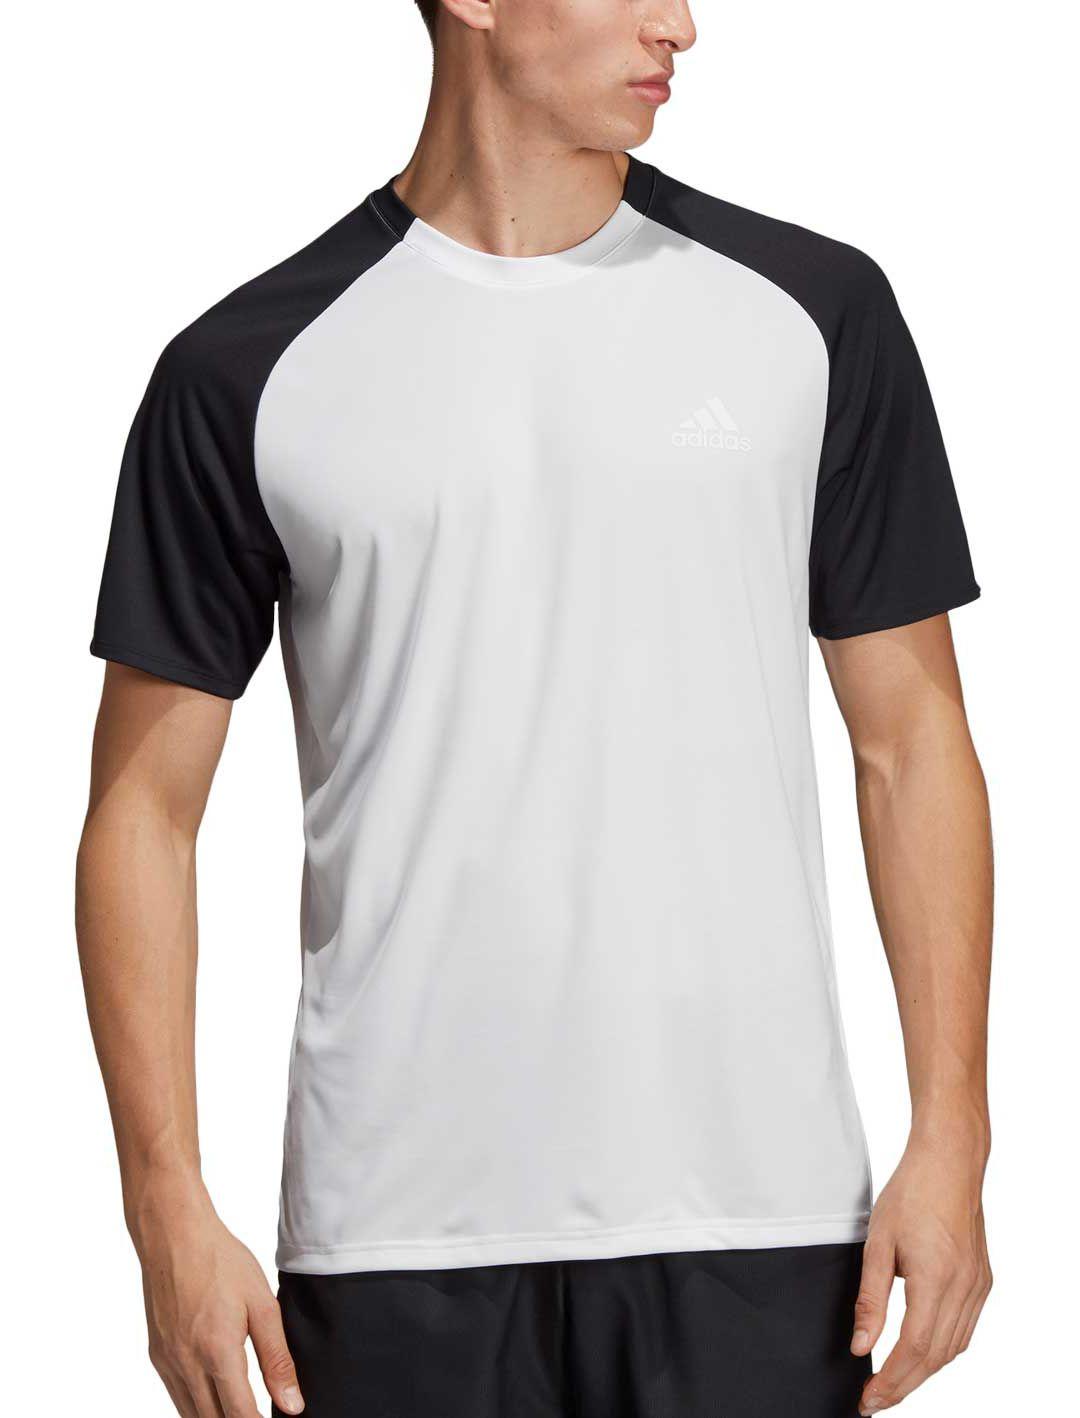 the latest 354cf 0435b adidas Men's Club Colorblock Tennis Shirt | DICK'S Sporting ...